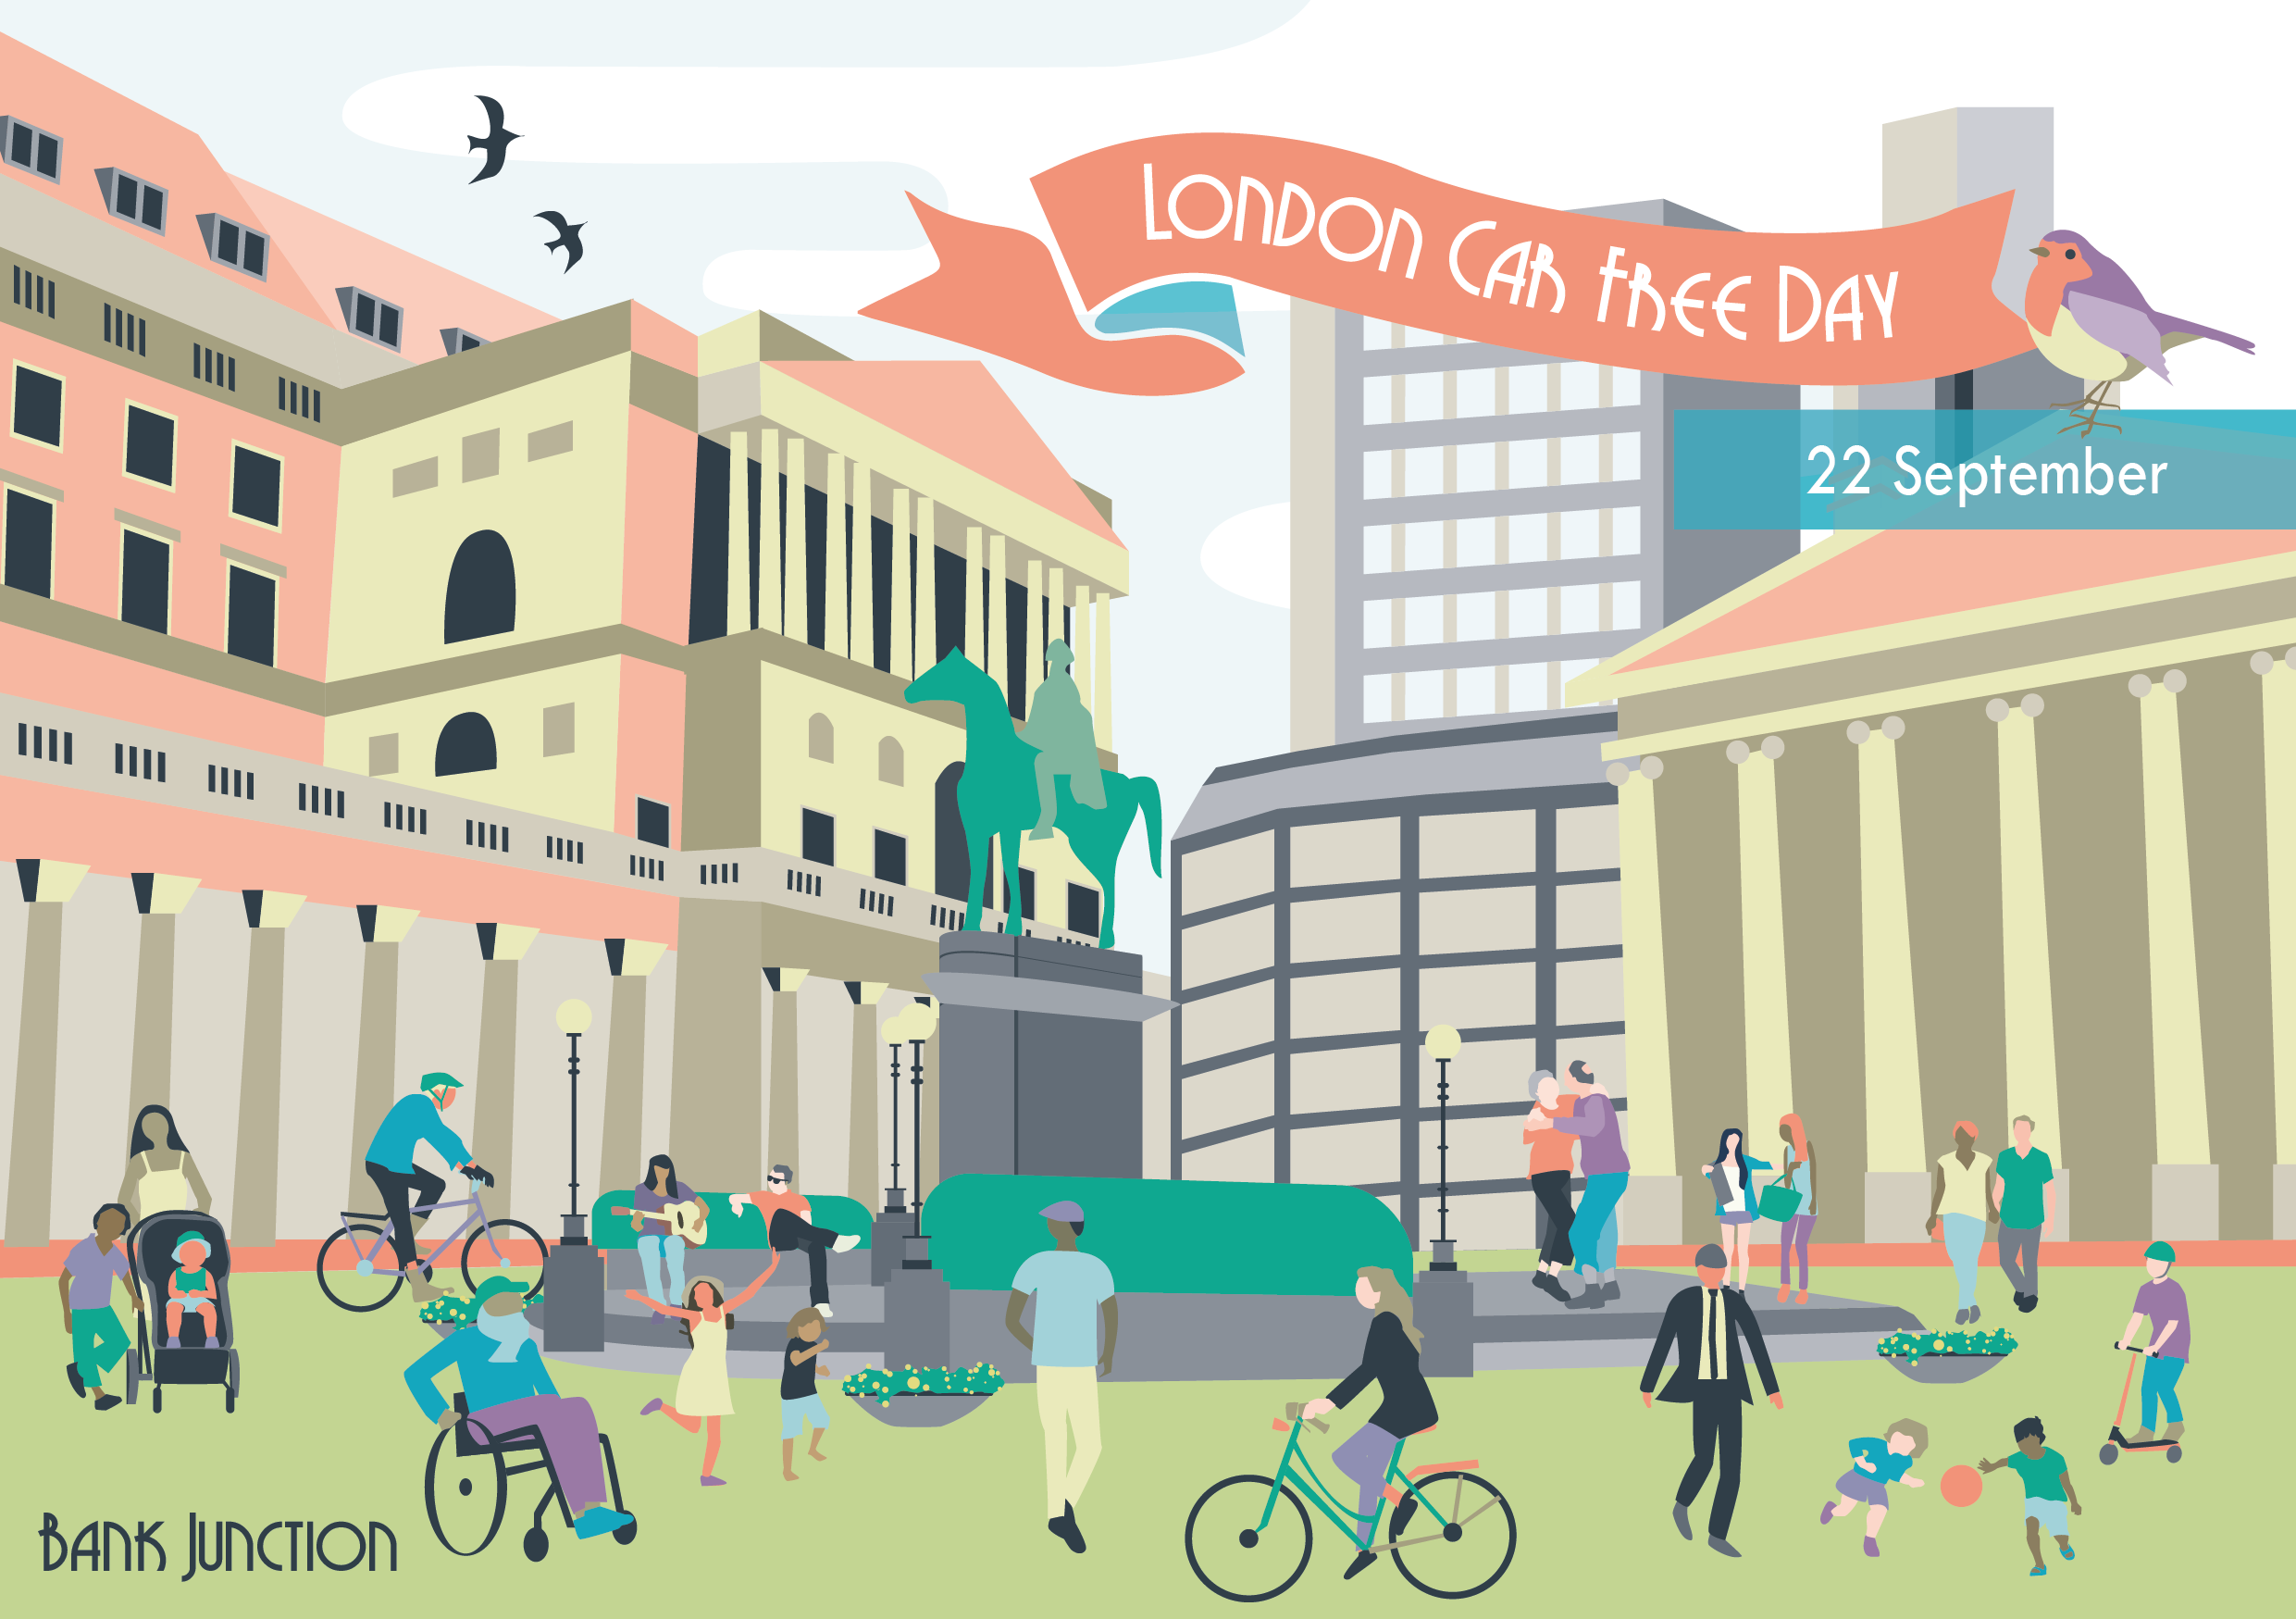 london_car_free_day_Postcards_7_Print-01.png